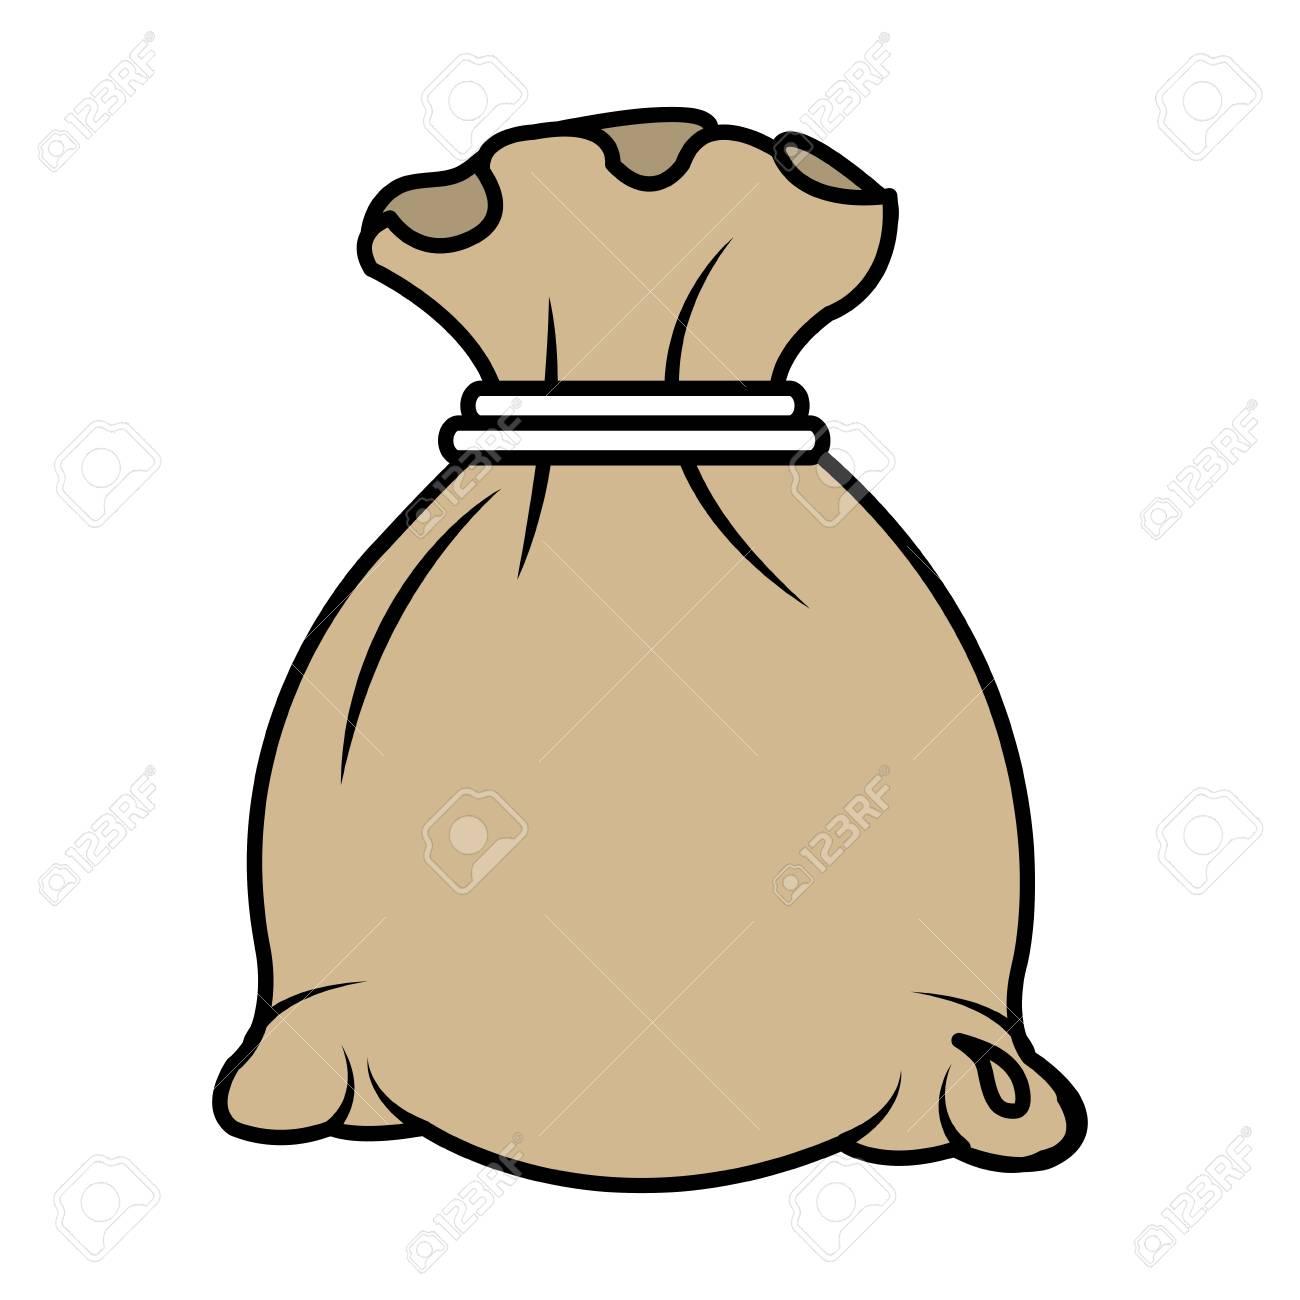 money bag isolated icon vector illustration design - 87669946